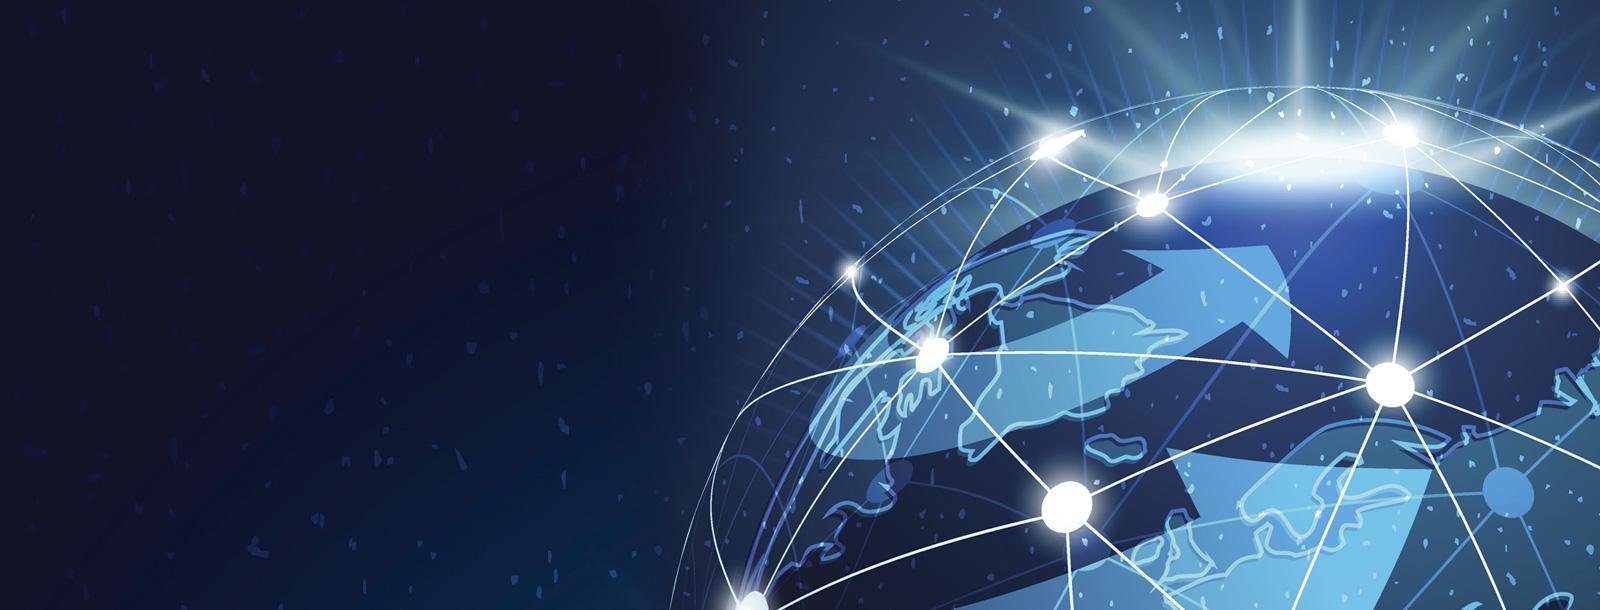 COVID-19: The Global Supply Chain